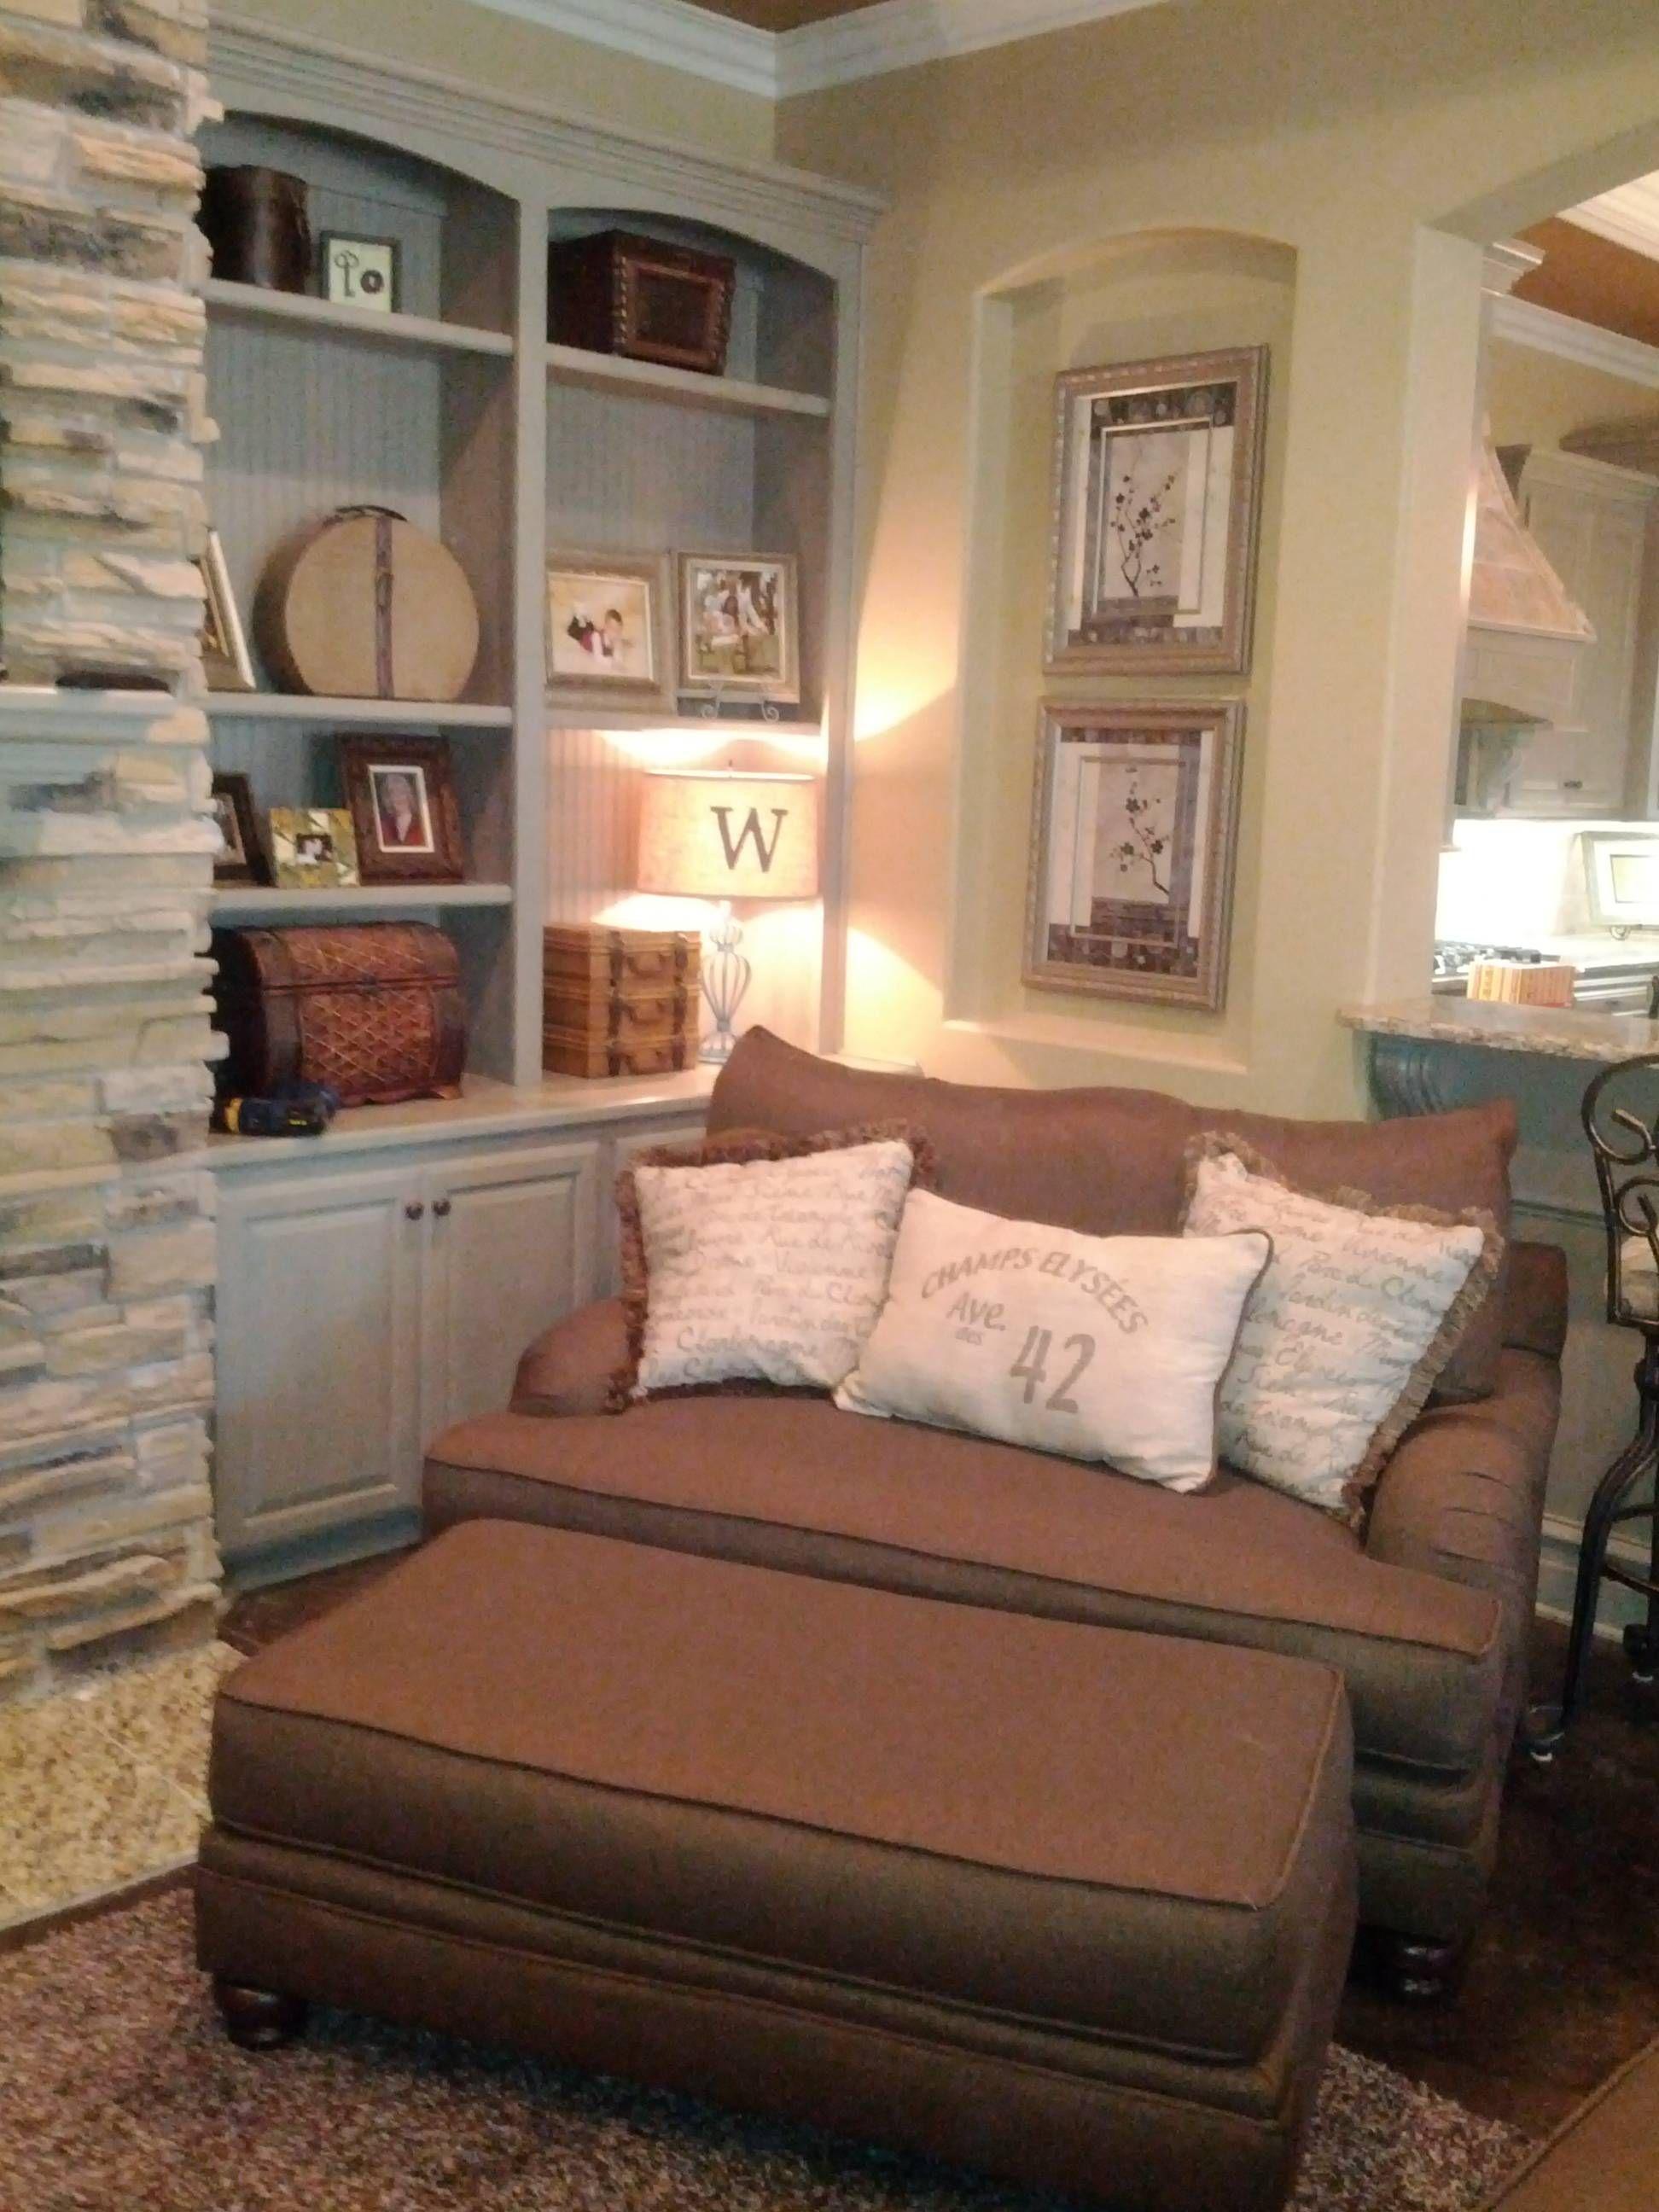 Chair In Caddy Corner With Shelf Next